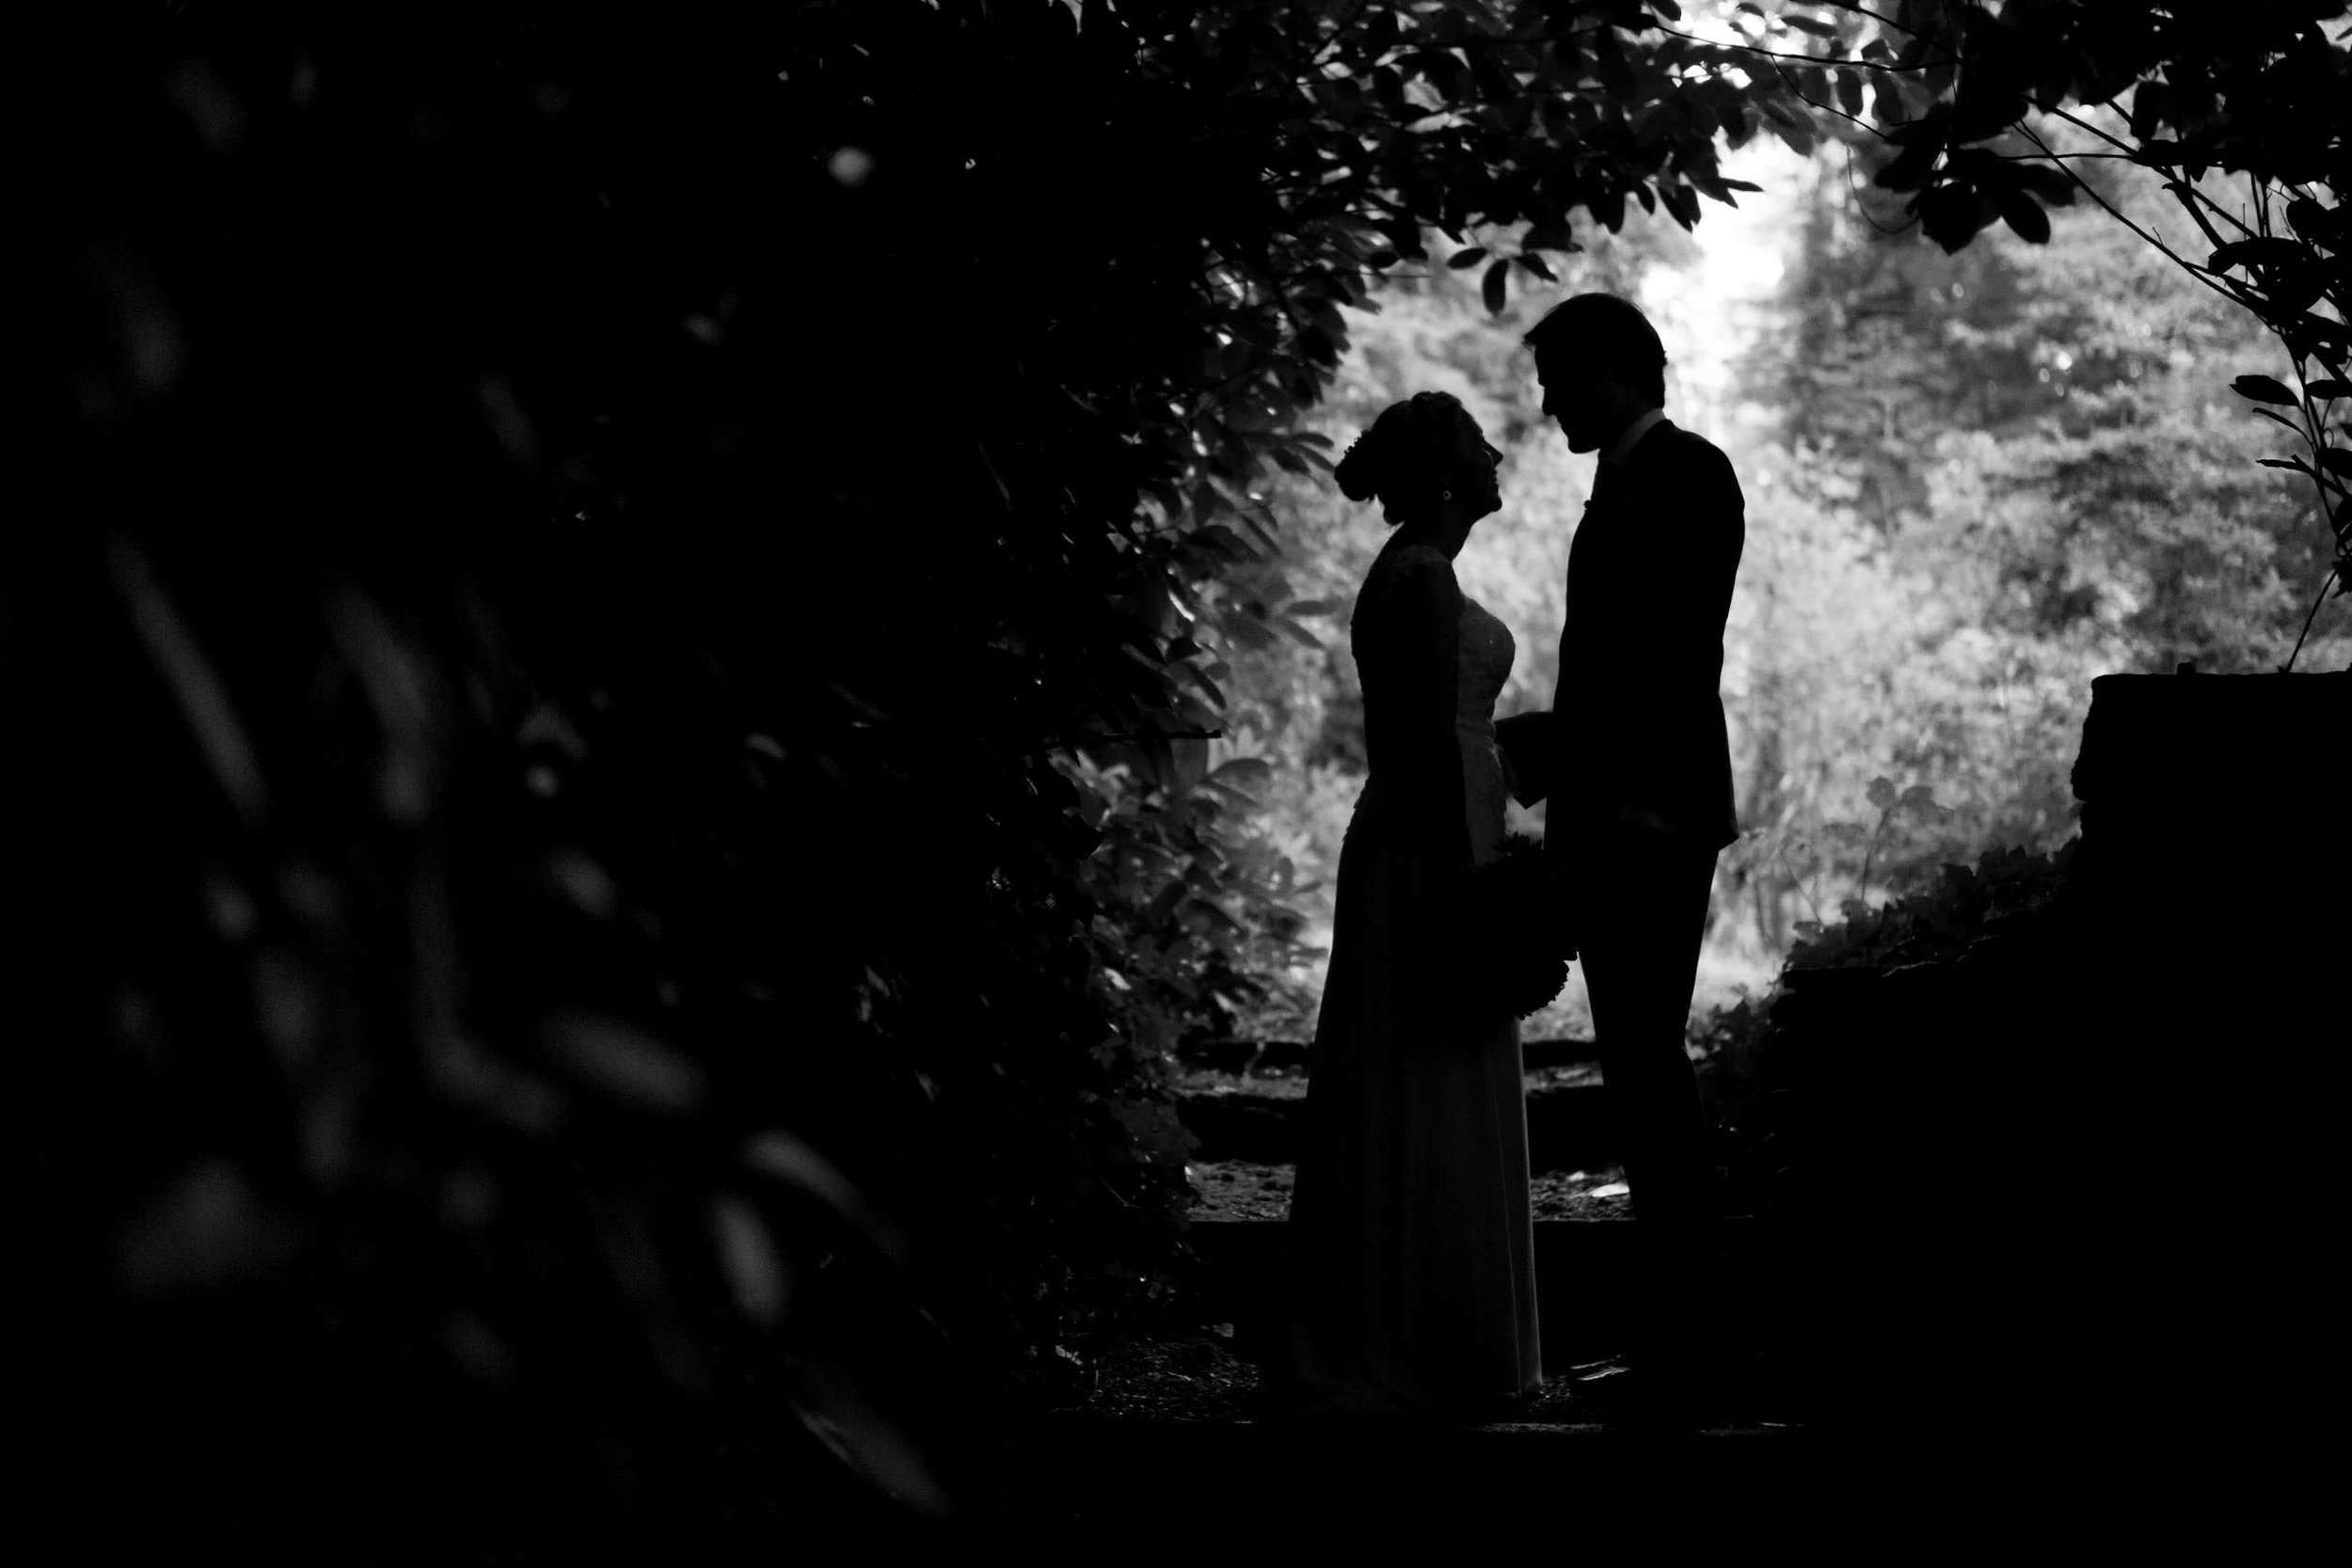 Bucklands-Tout-Saints-Devon-Wedding-Photography (13).jpg